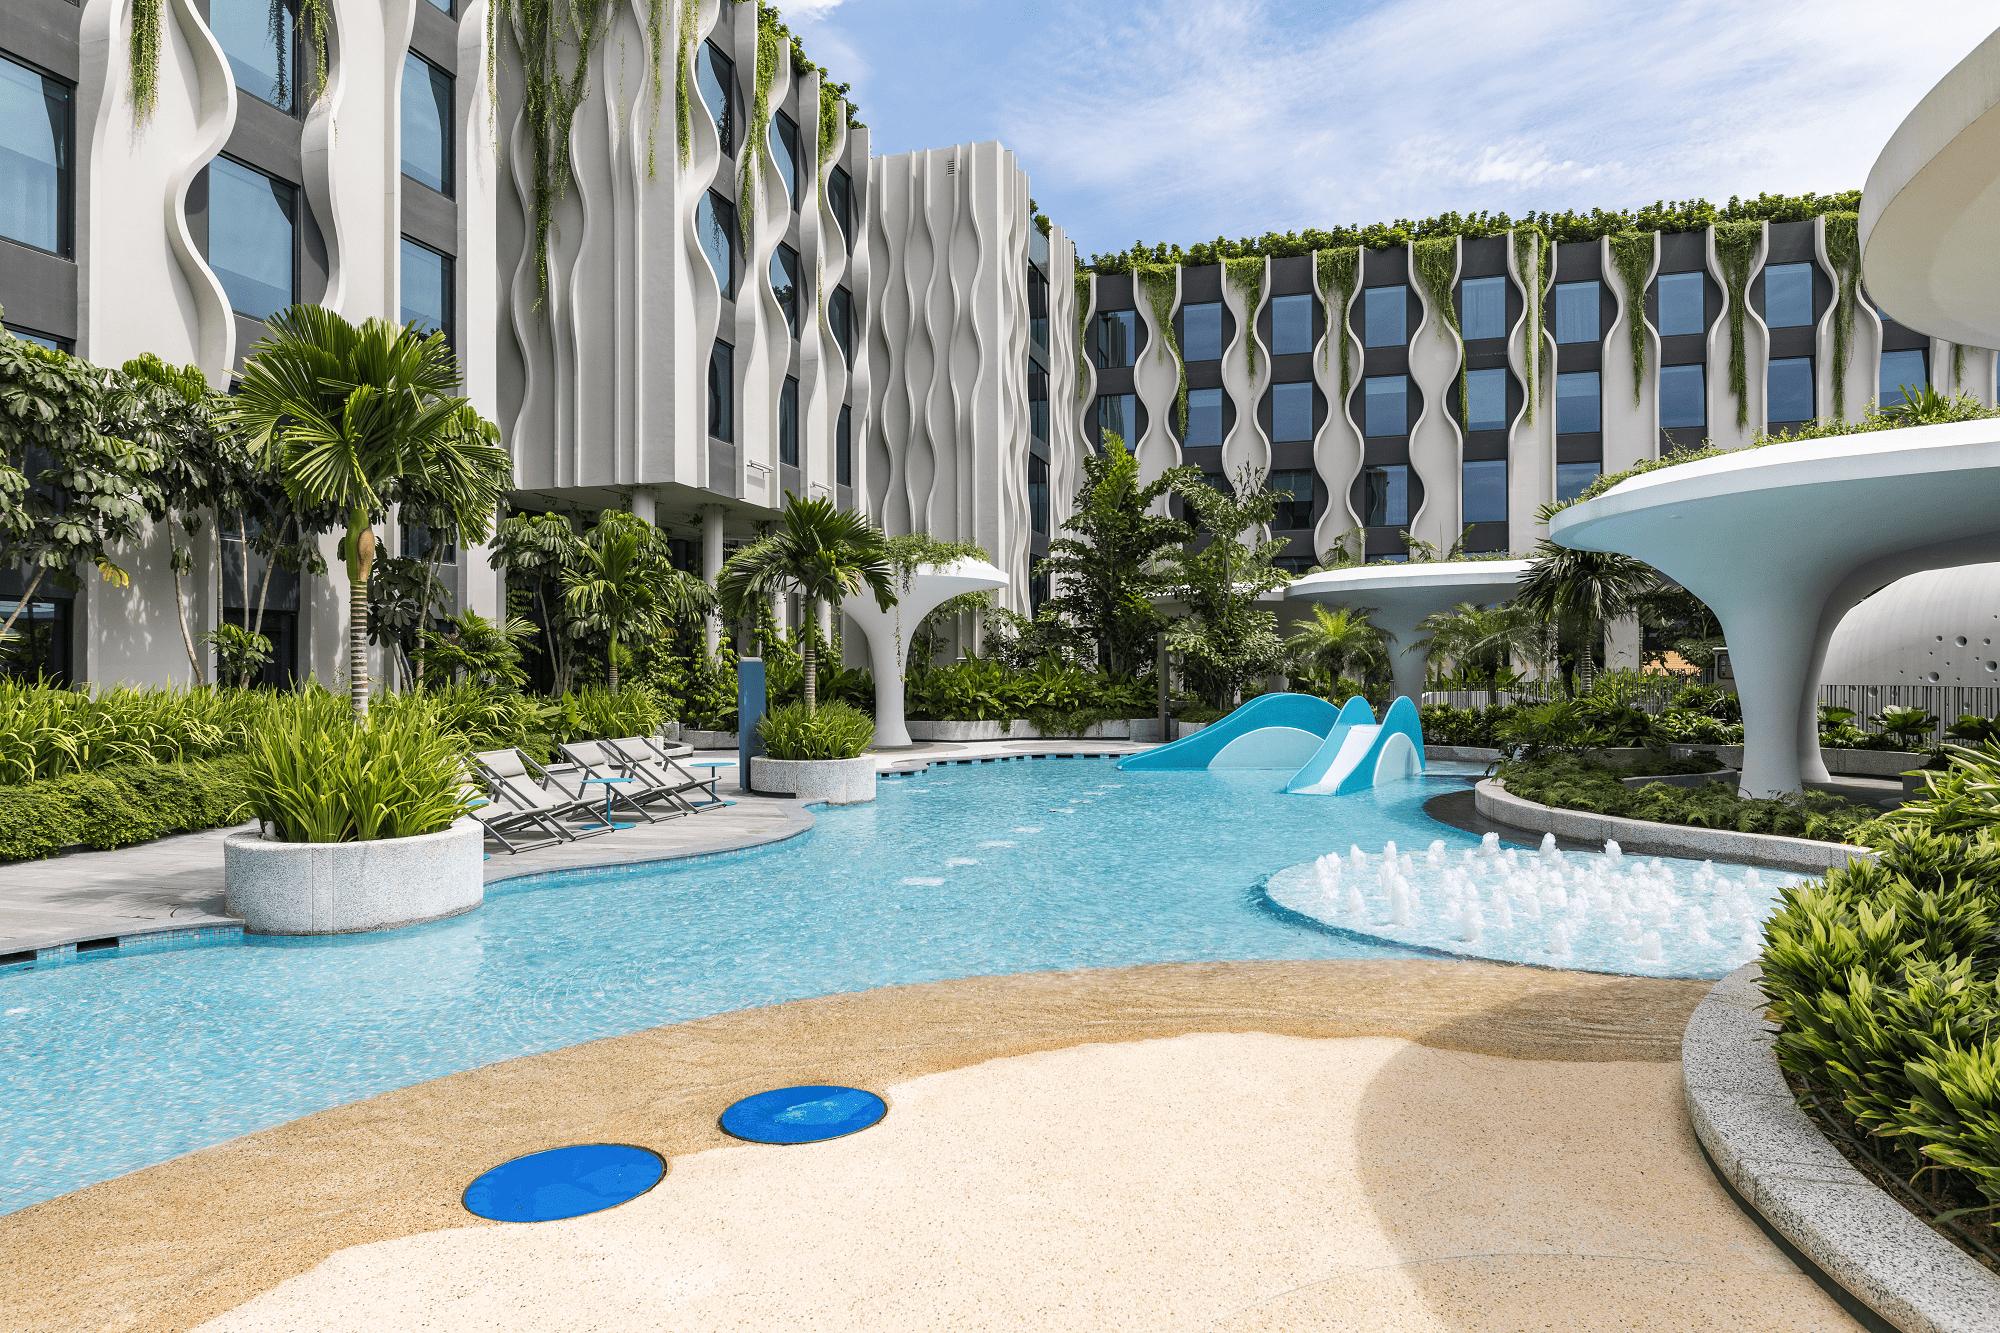 Sentosa Hotels Singapore Staycation Village Pool